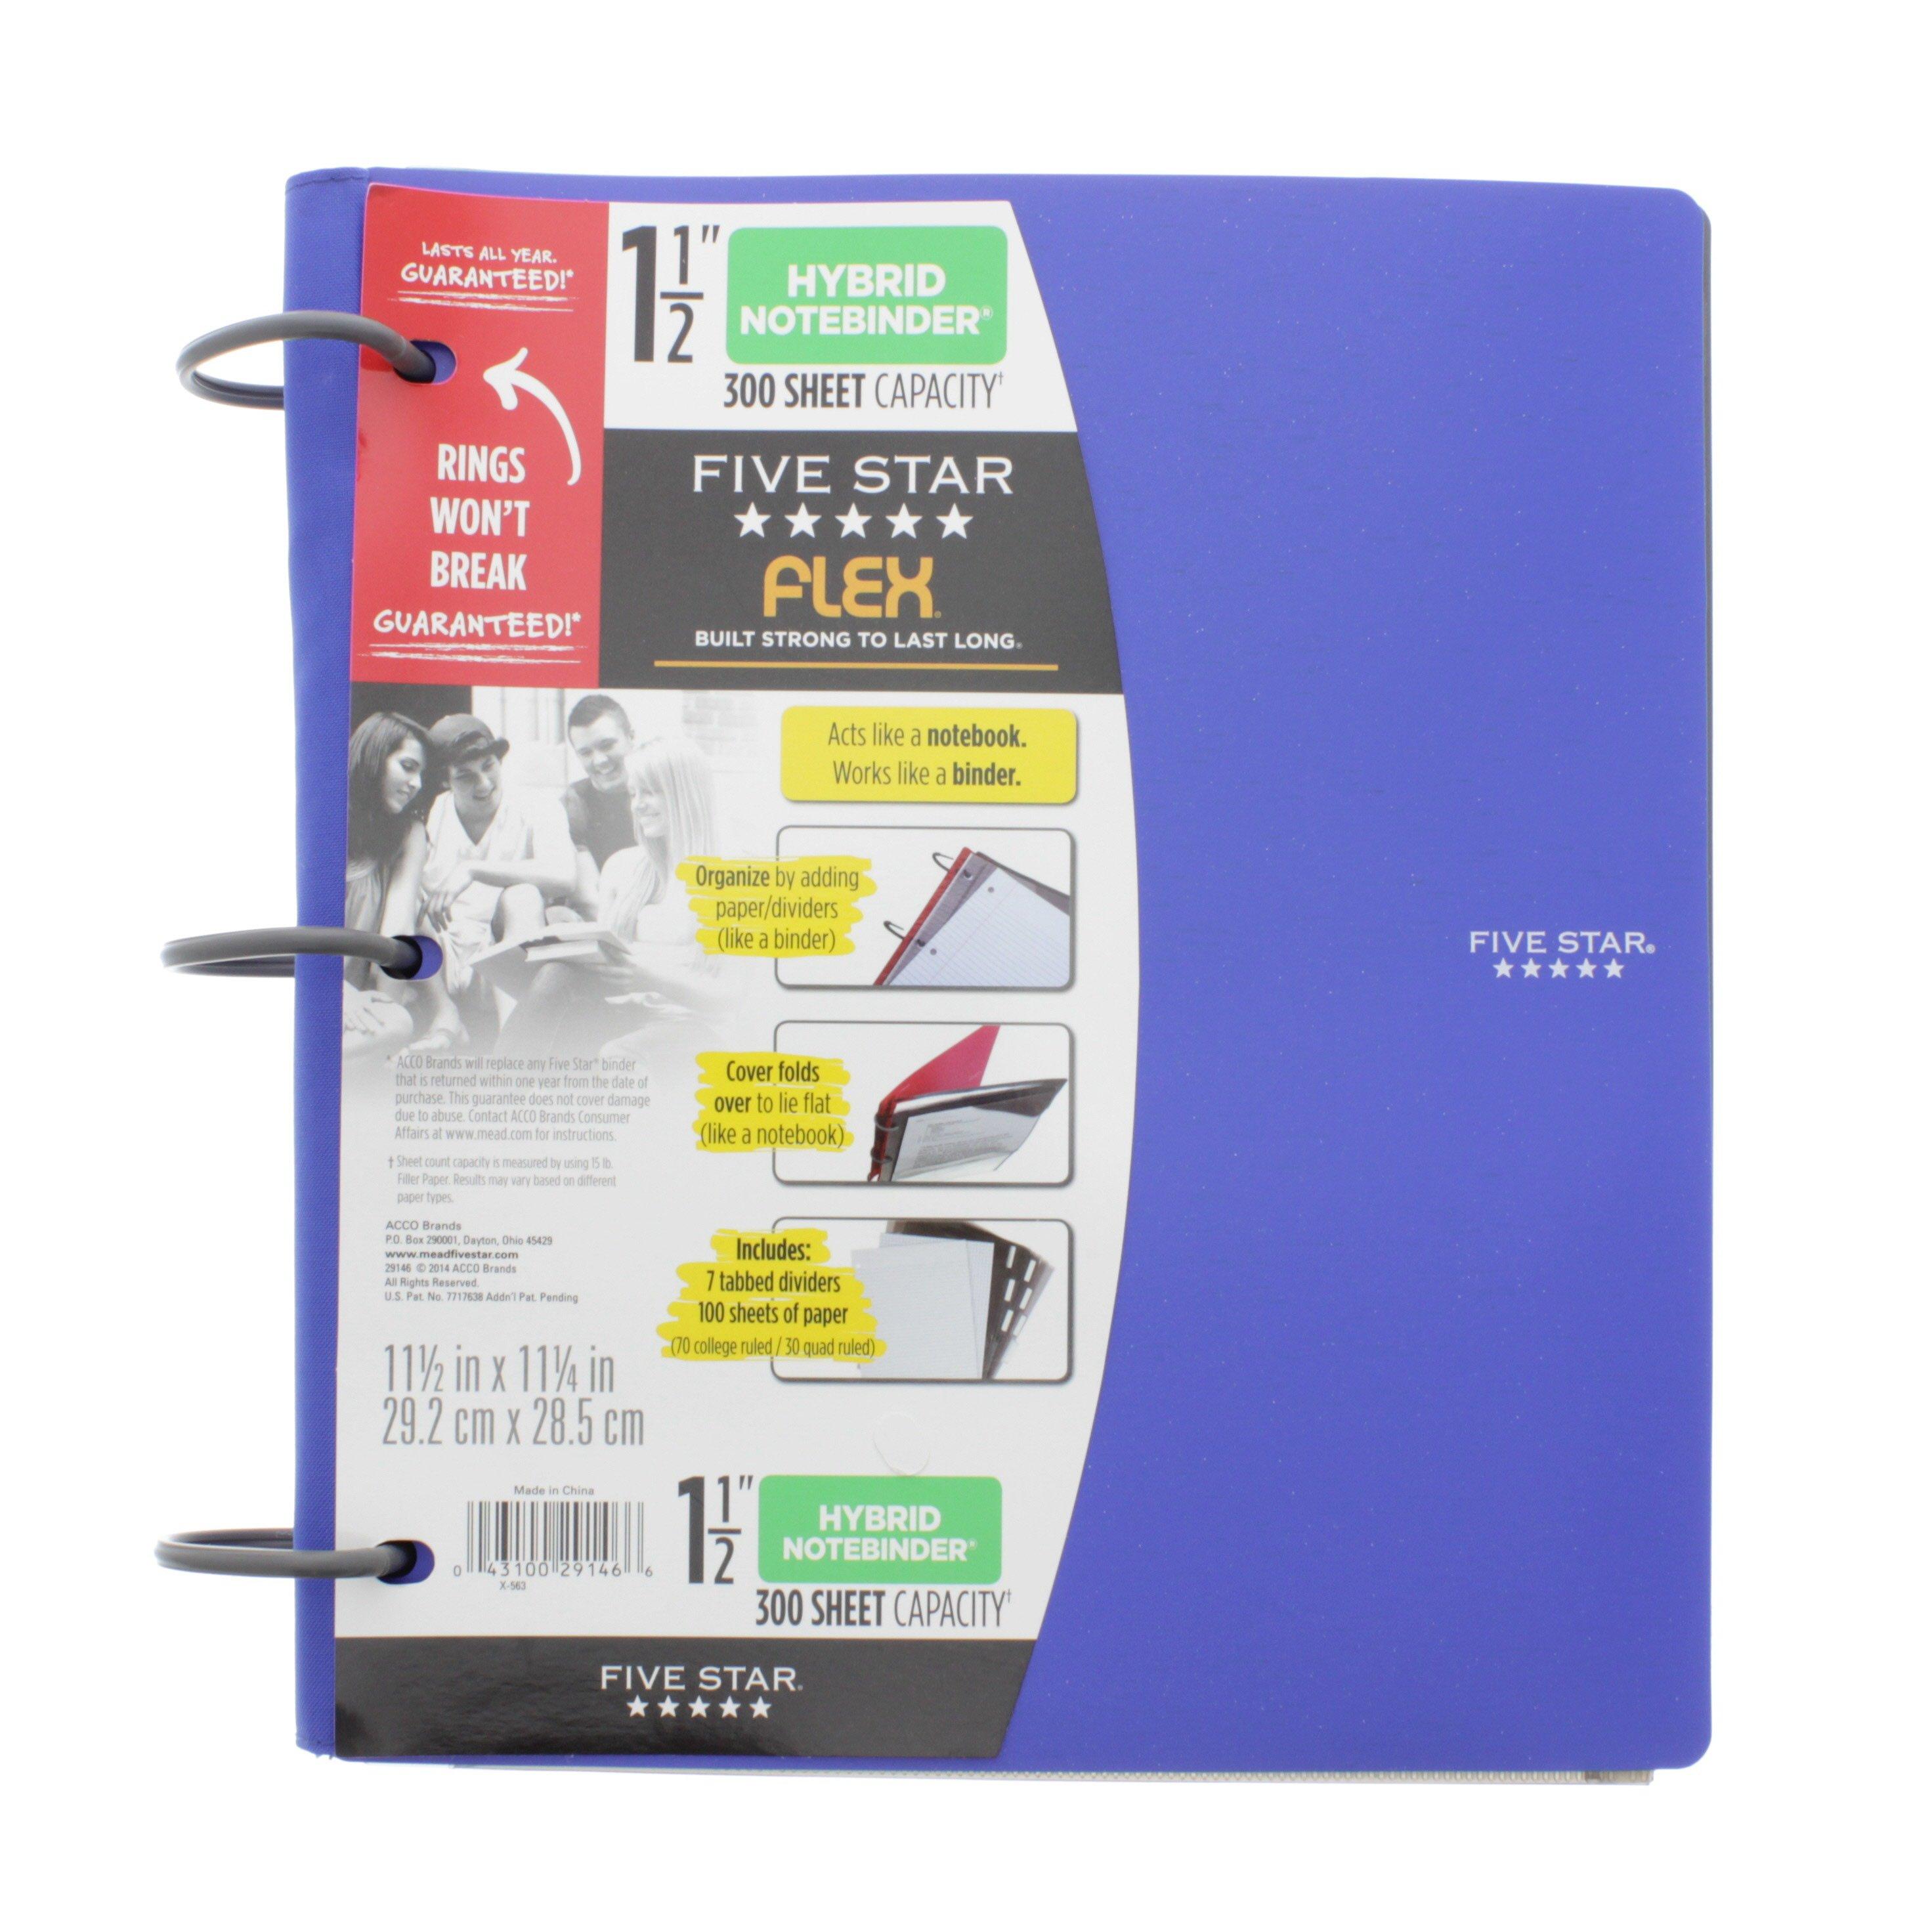 FIVE STAR Flex Hybrid Notebinder, 300 Sheet Capacity